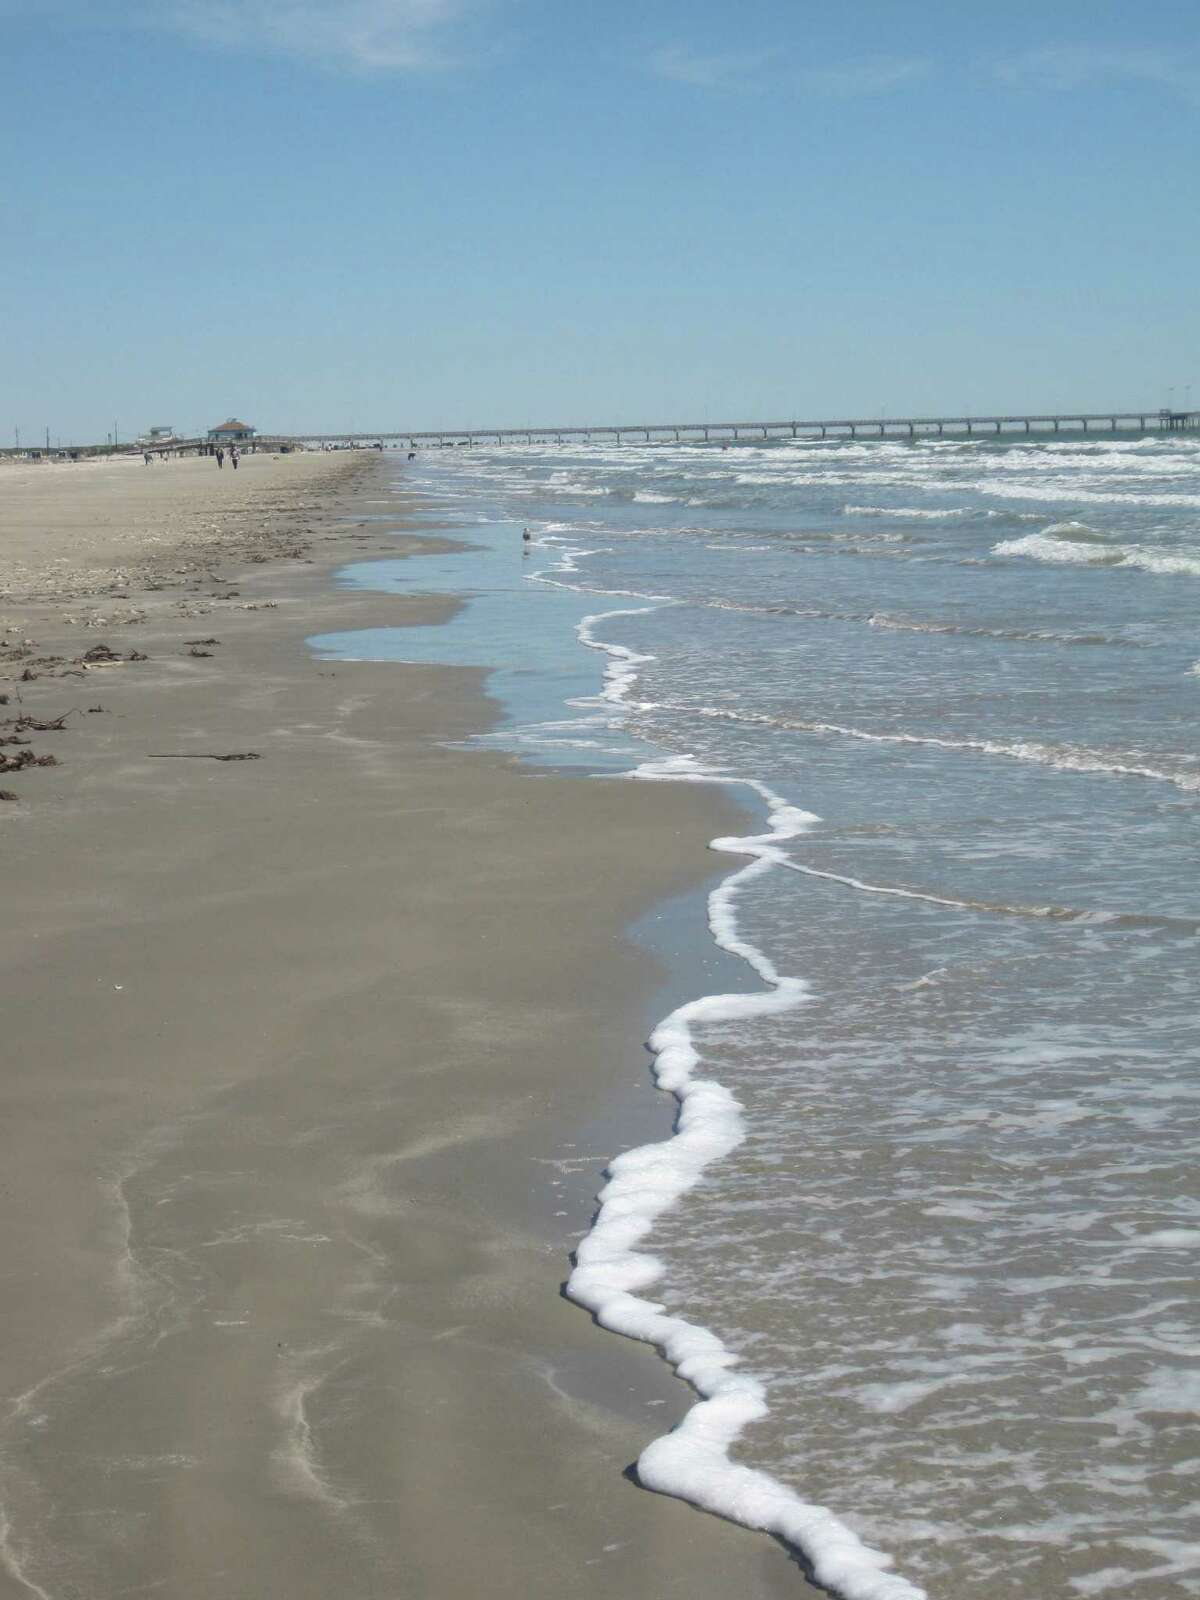 An estimated 5 million people visit the Port Aransas beach on an annual basis.